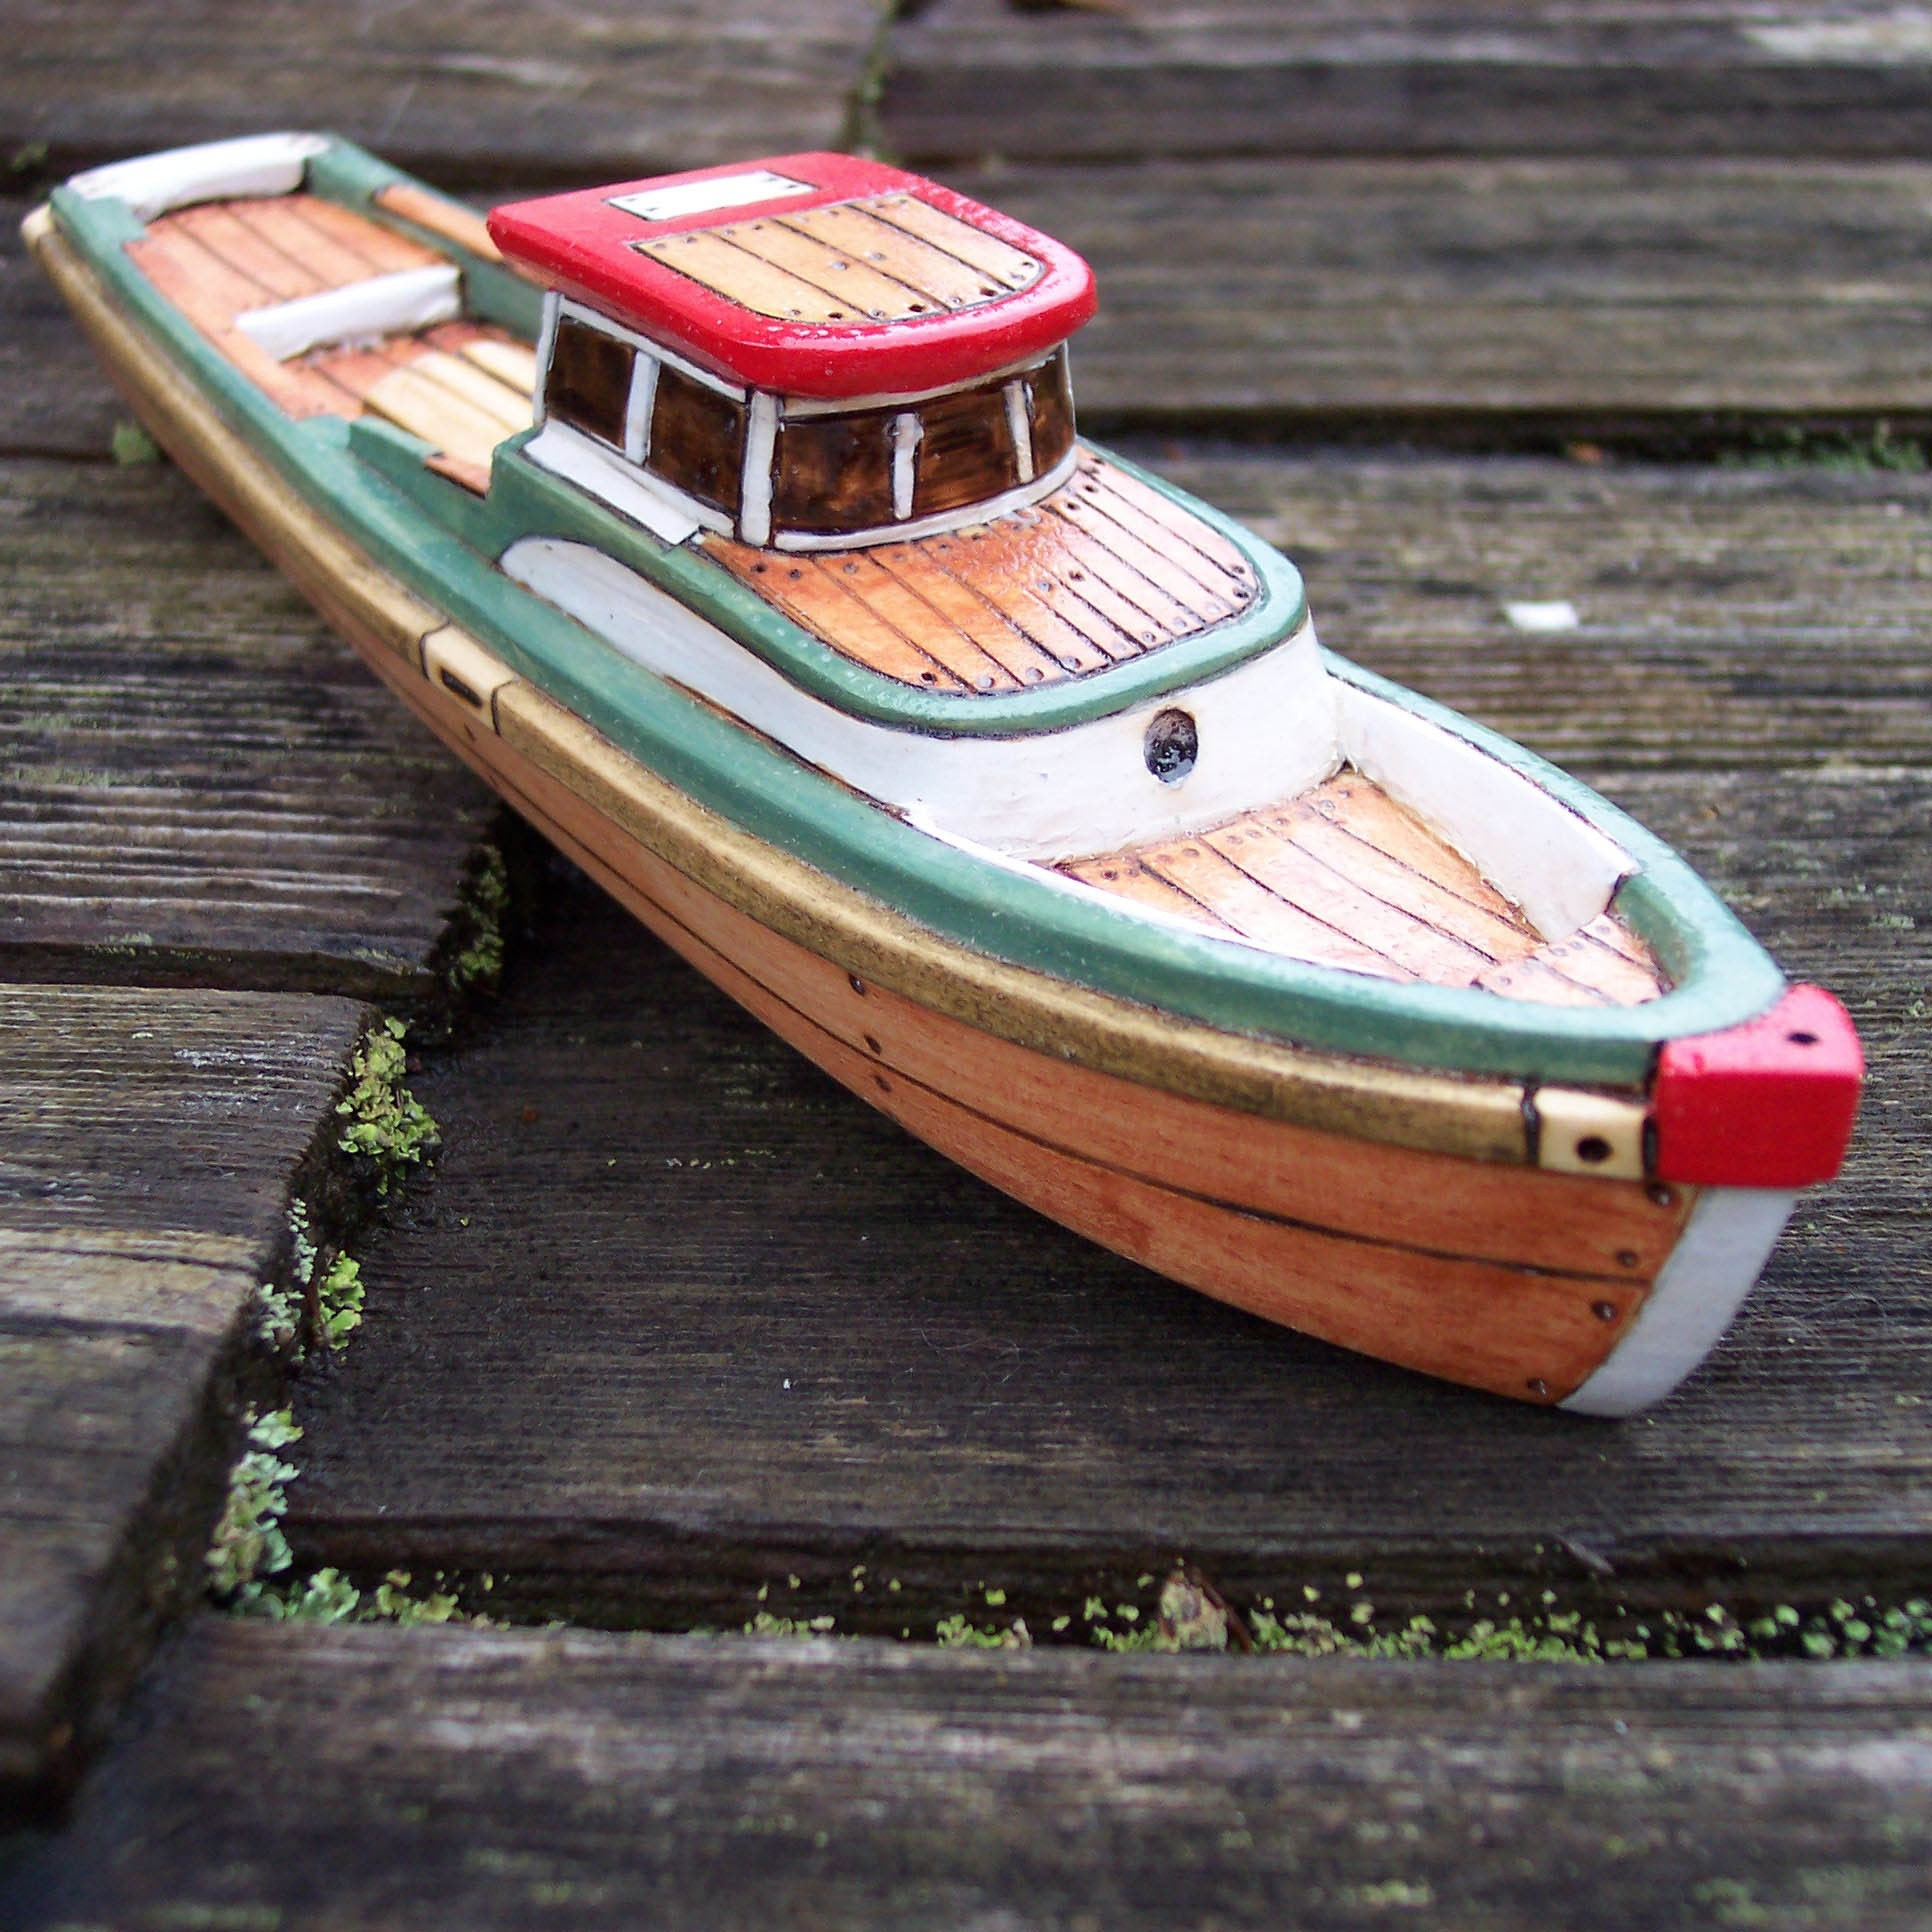 Сделайте лодку, яхту или катер своими руками 15